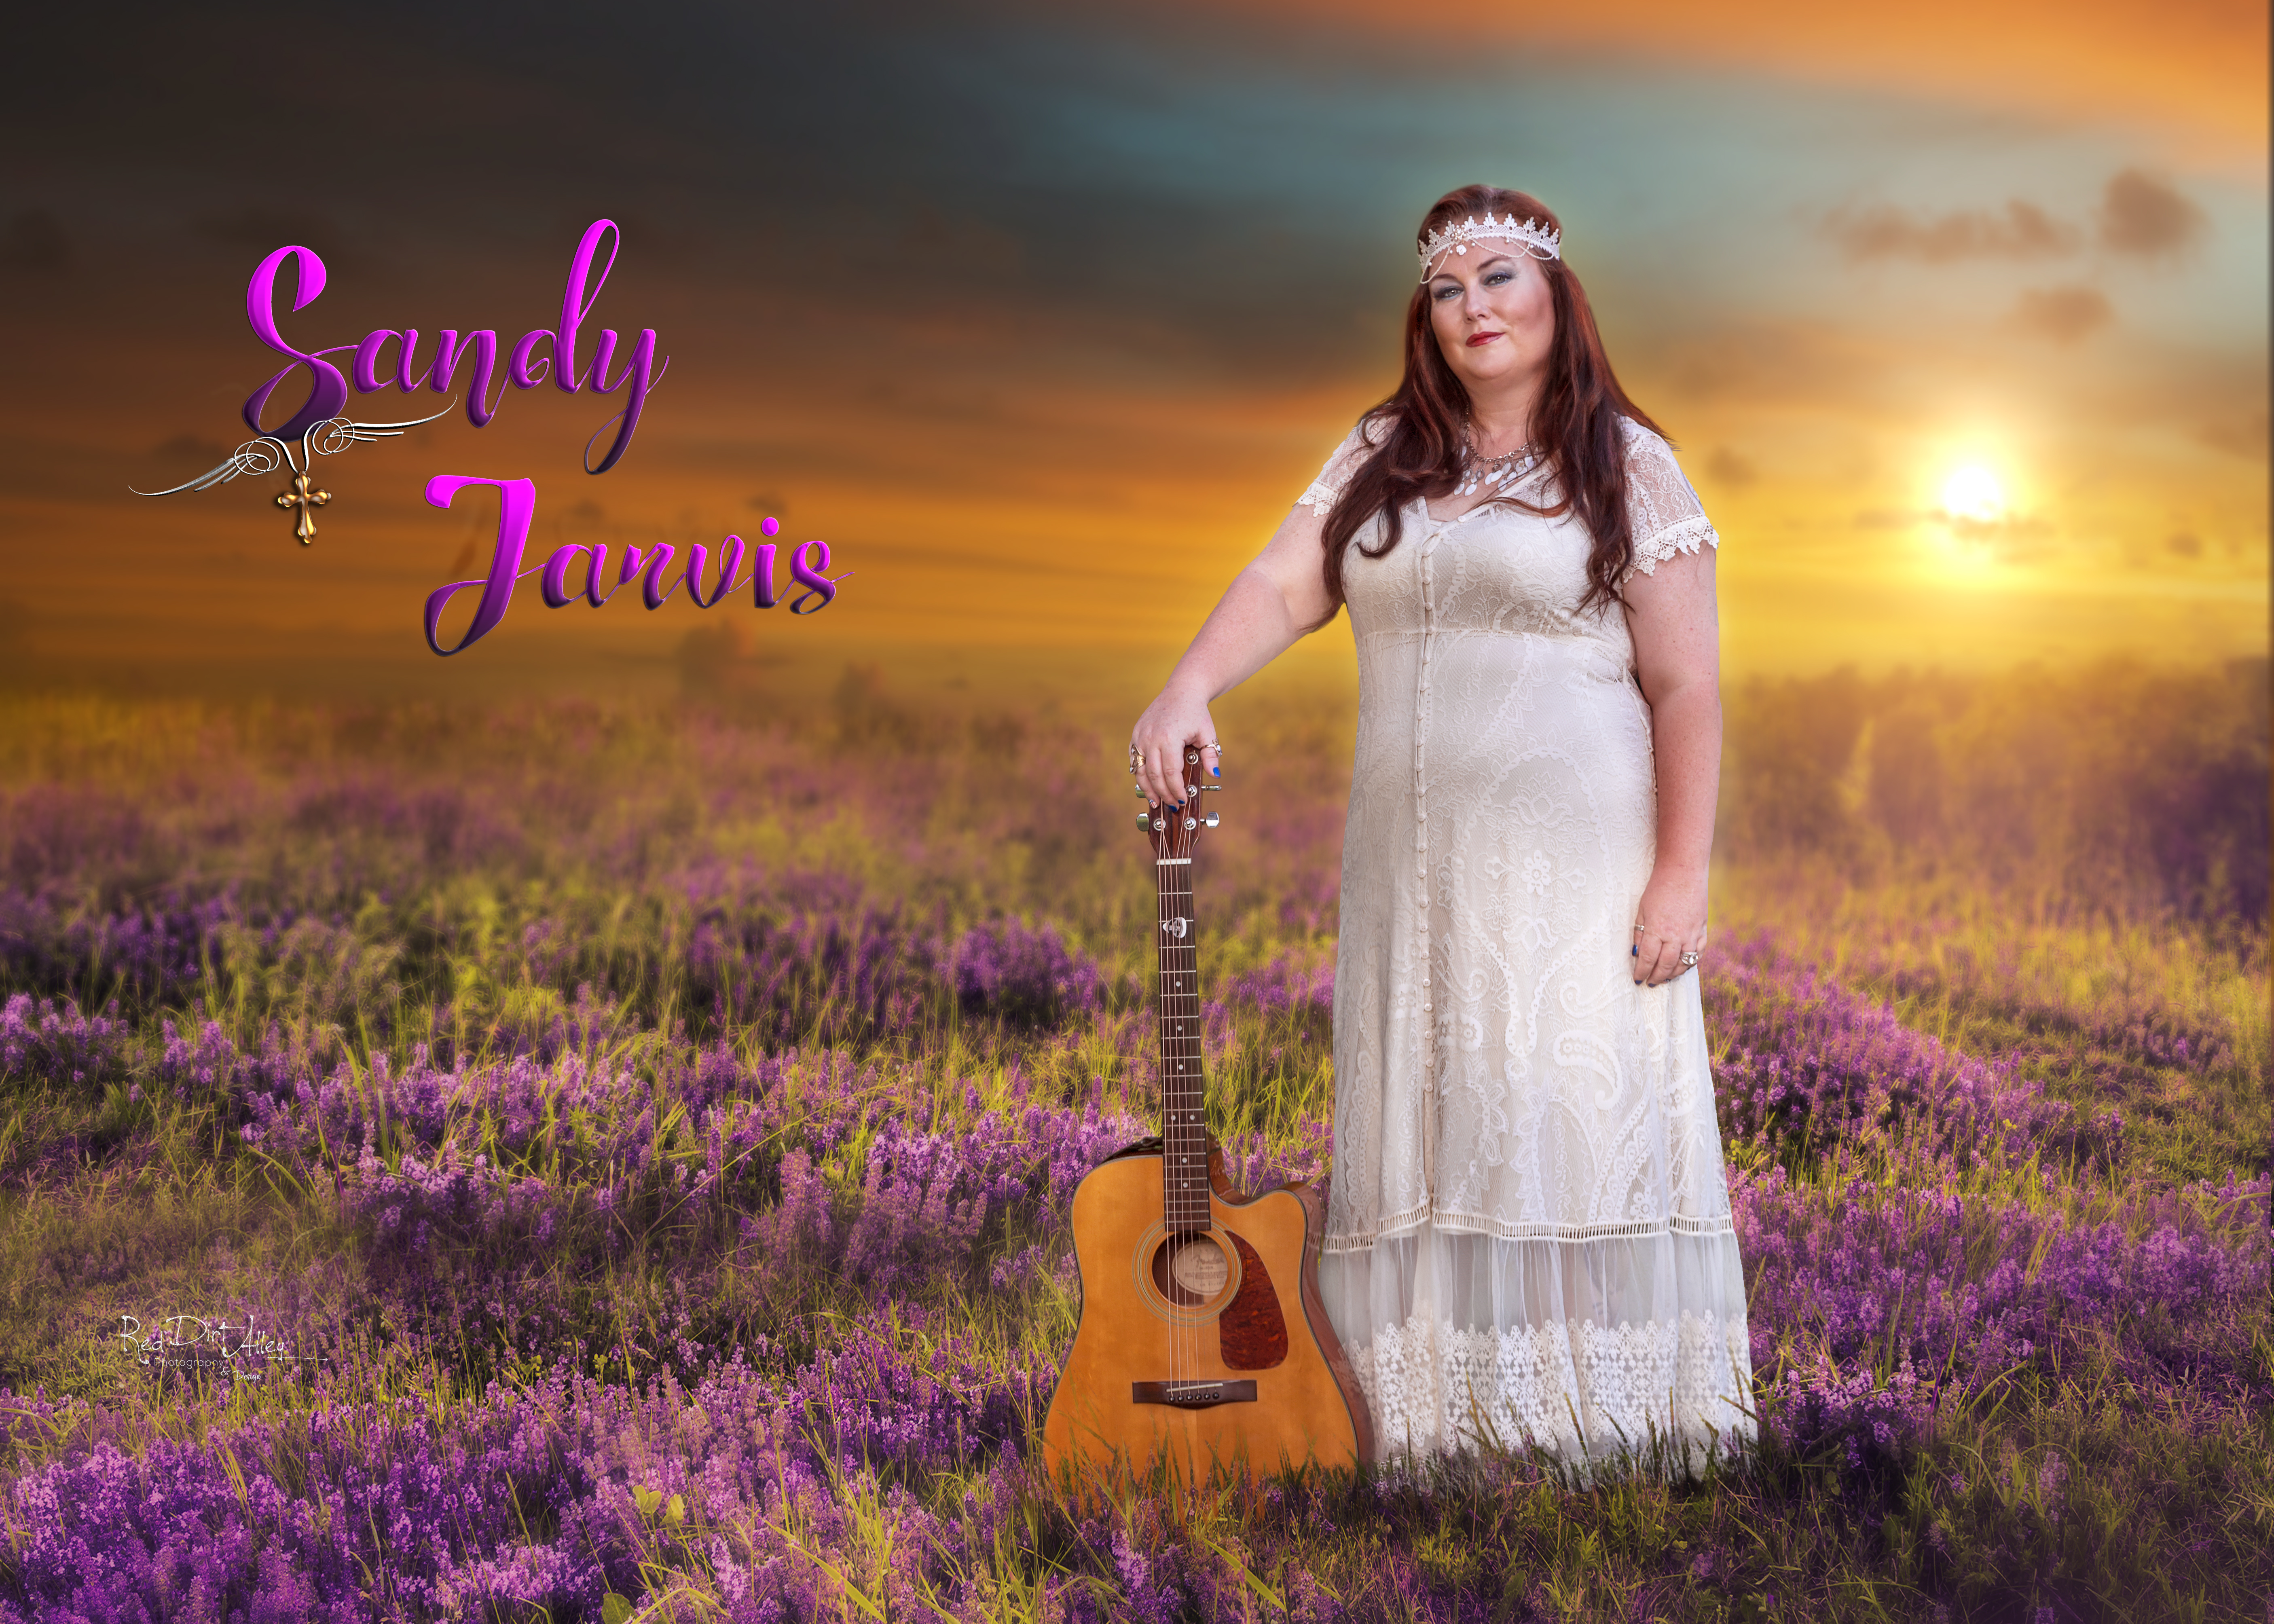 Sandy Jarvis